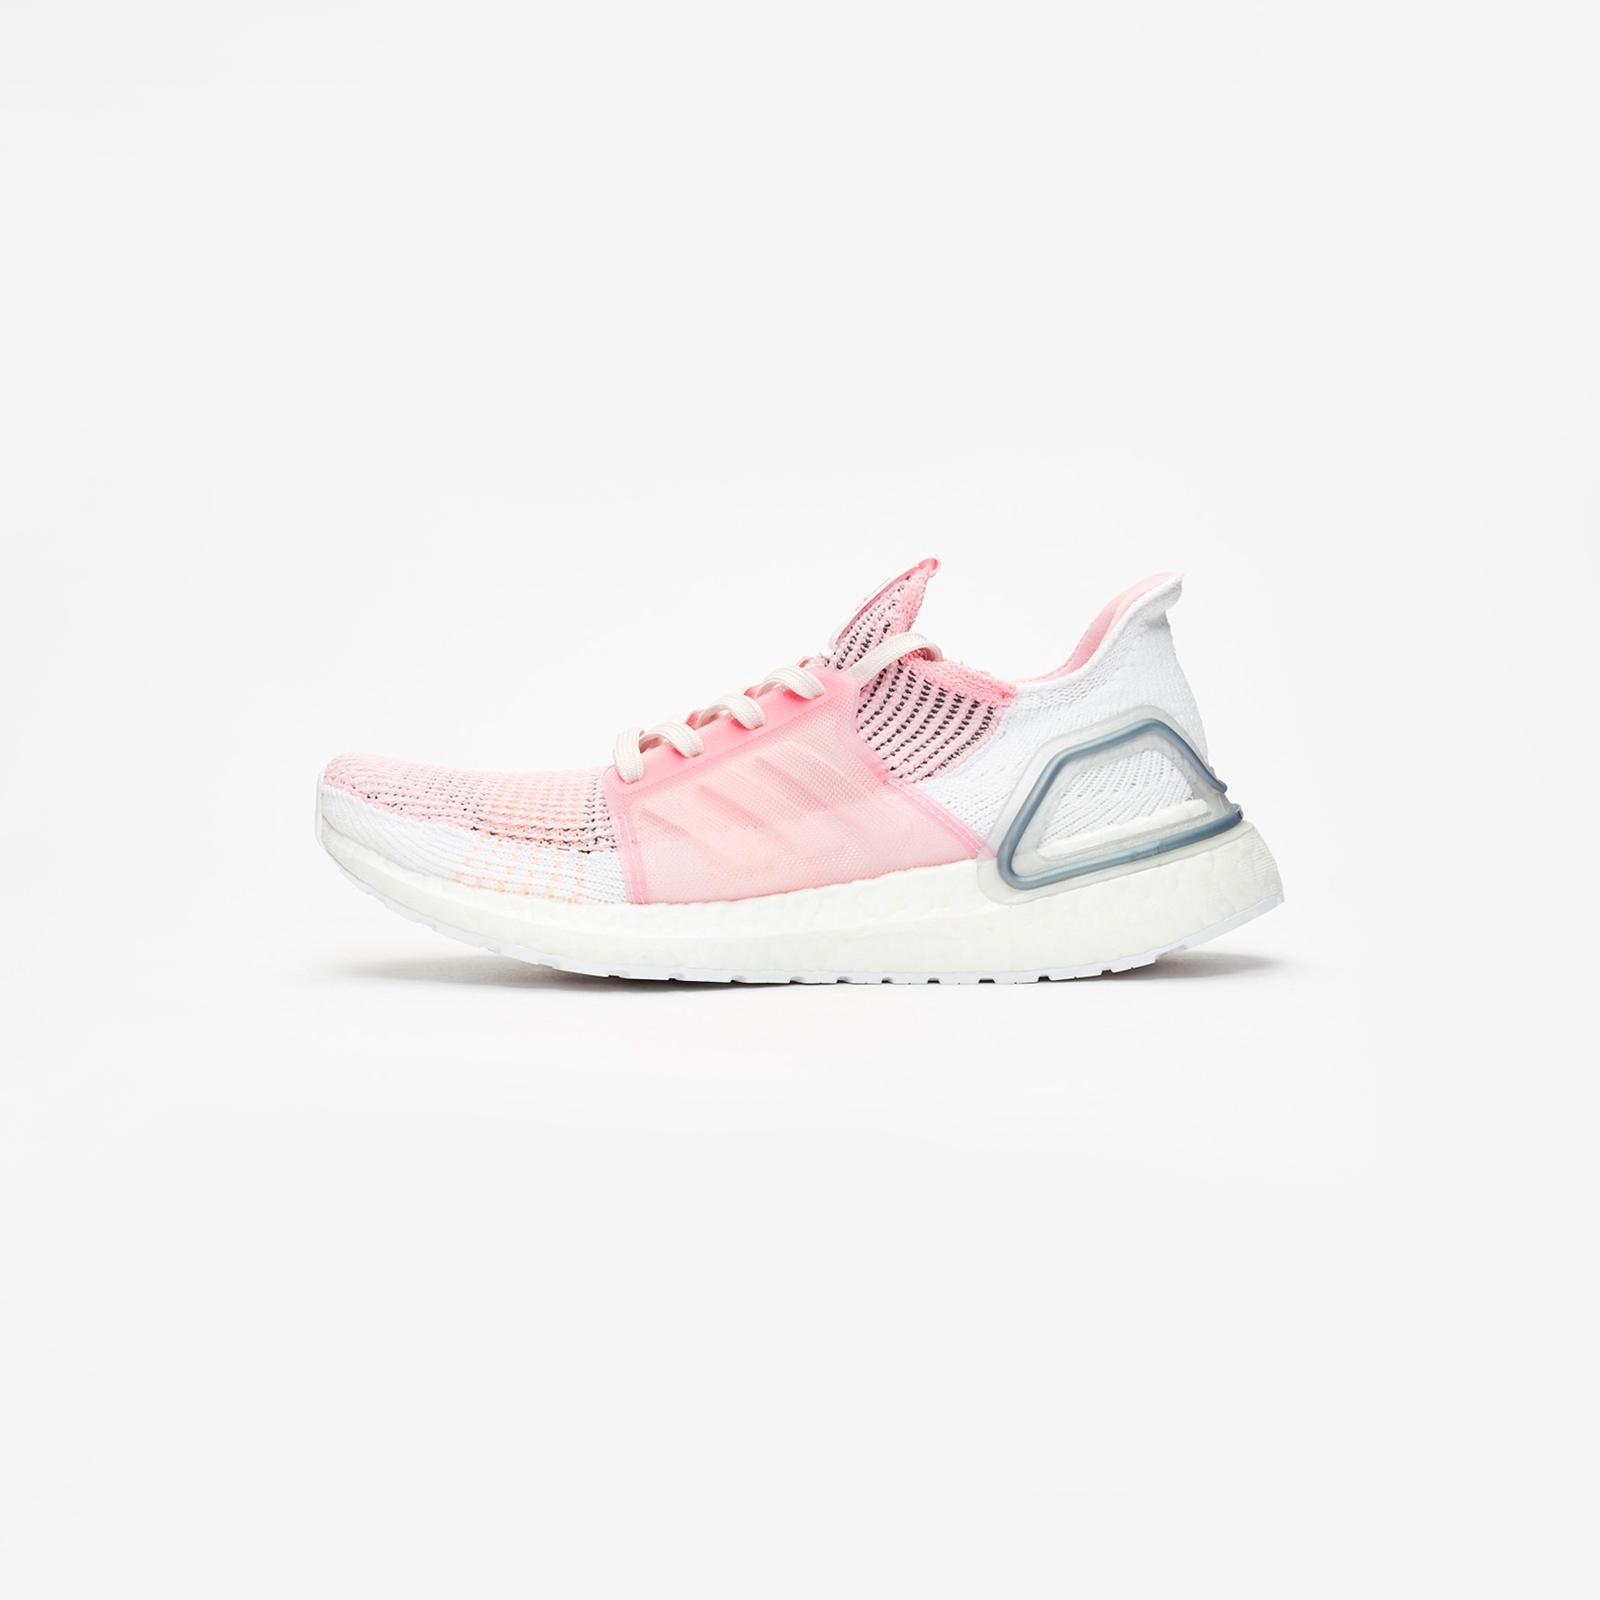 ccf5c1214 adidas Ultraboost 19 W - F35283 - Sneakersnstuff